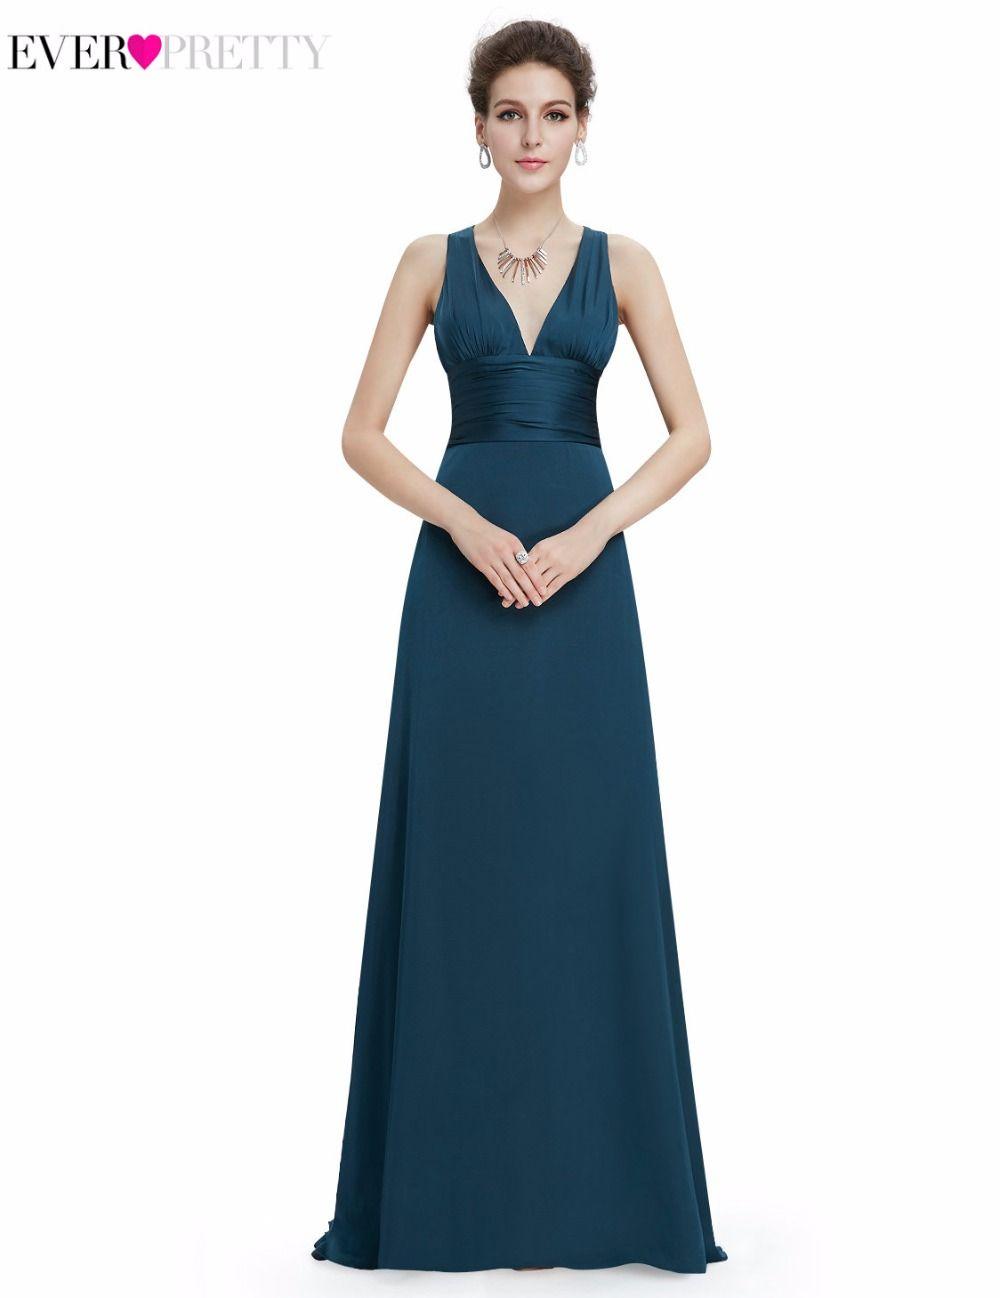 9e96a72f9f Clearance Sale] Sexy V Neck Evening Dresses HE09008 Ever Pretty ...